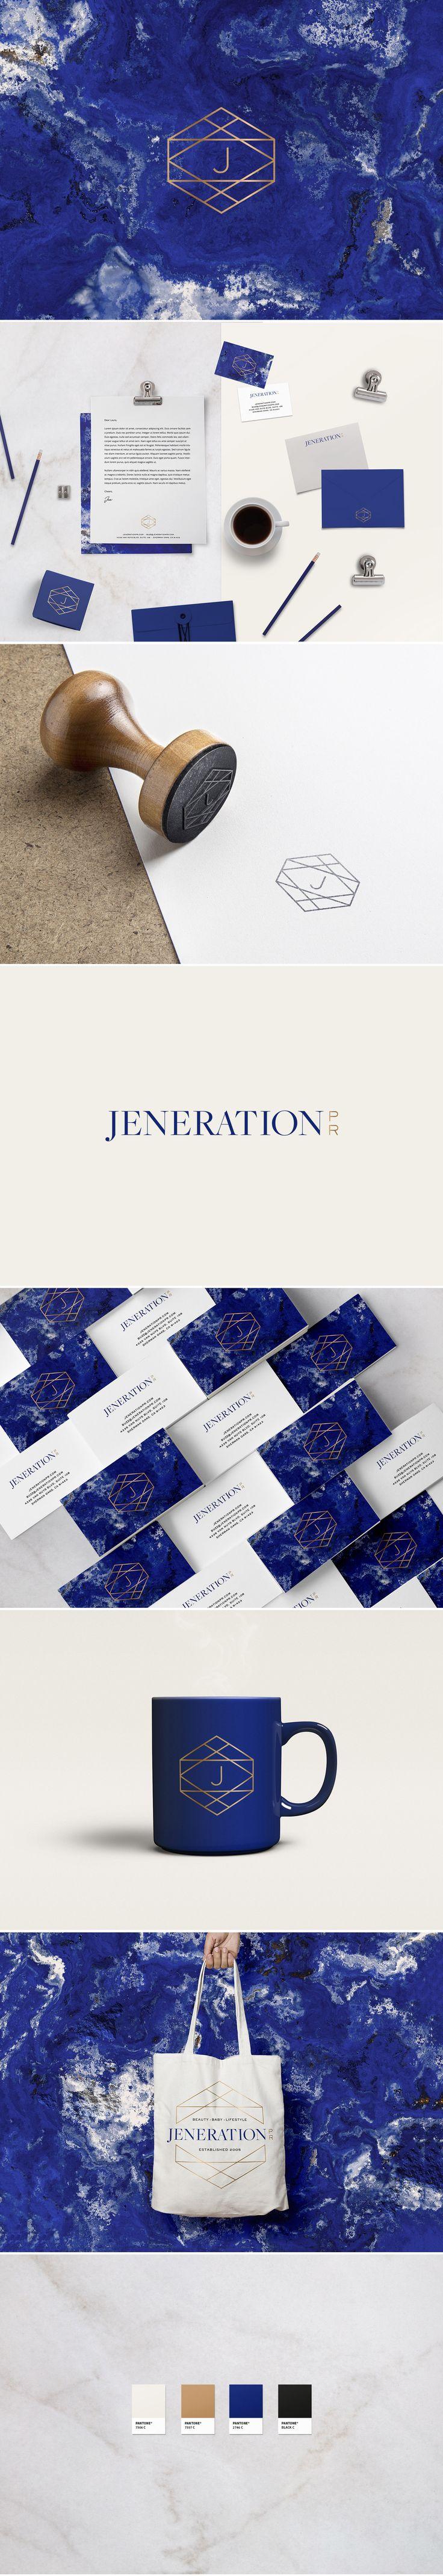 WE ARE BRANCH | JENERATION PR